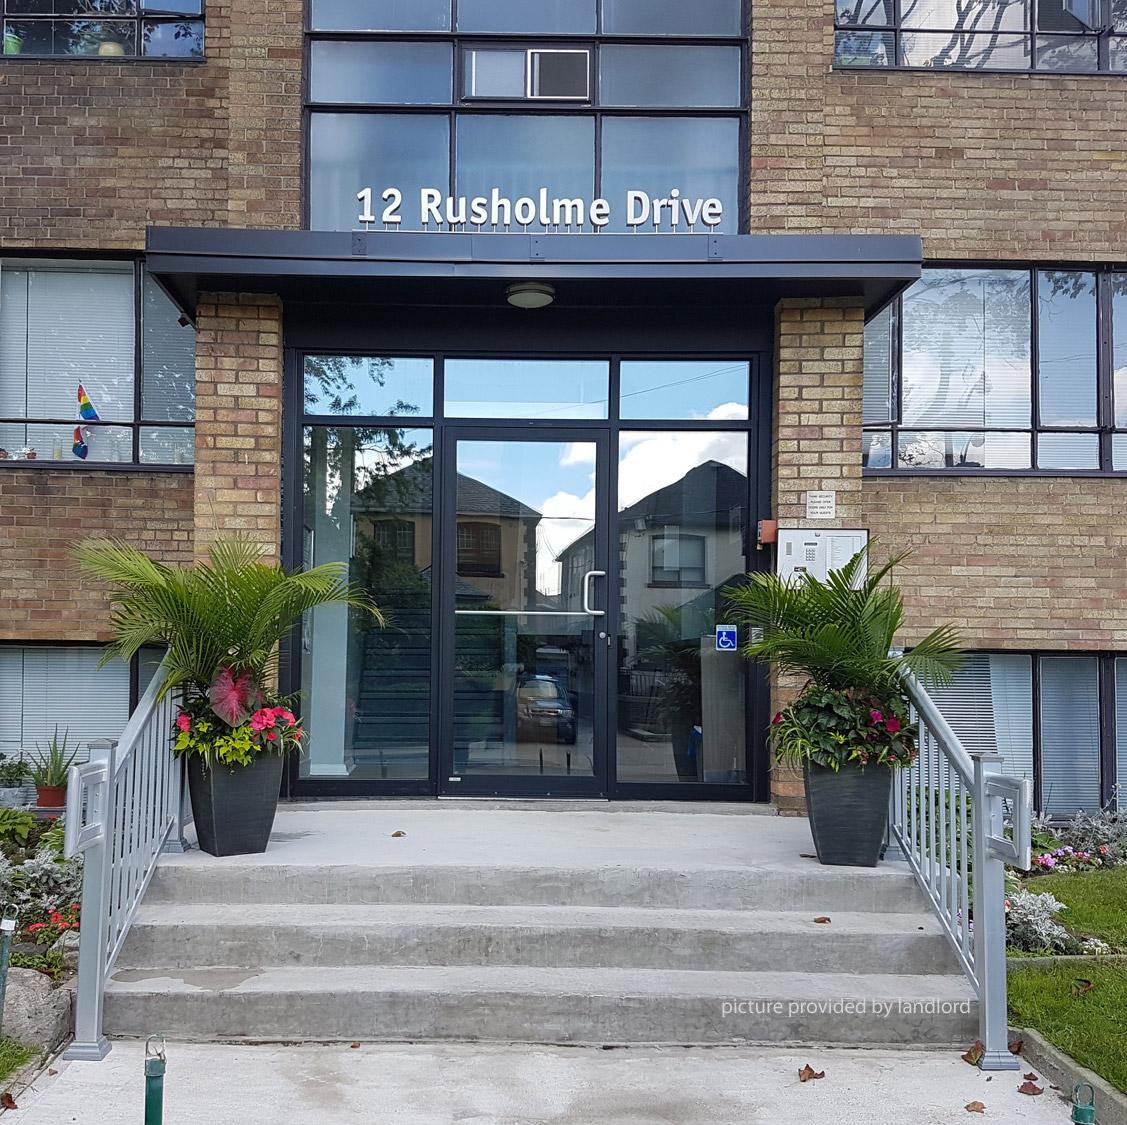 12-14 Rusholme Dr, TORONTO, ON : 1 Bedroom For Rent